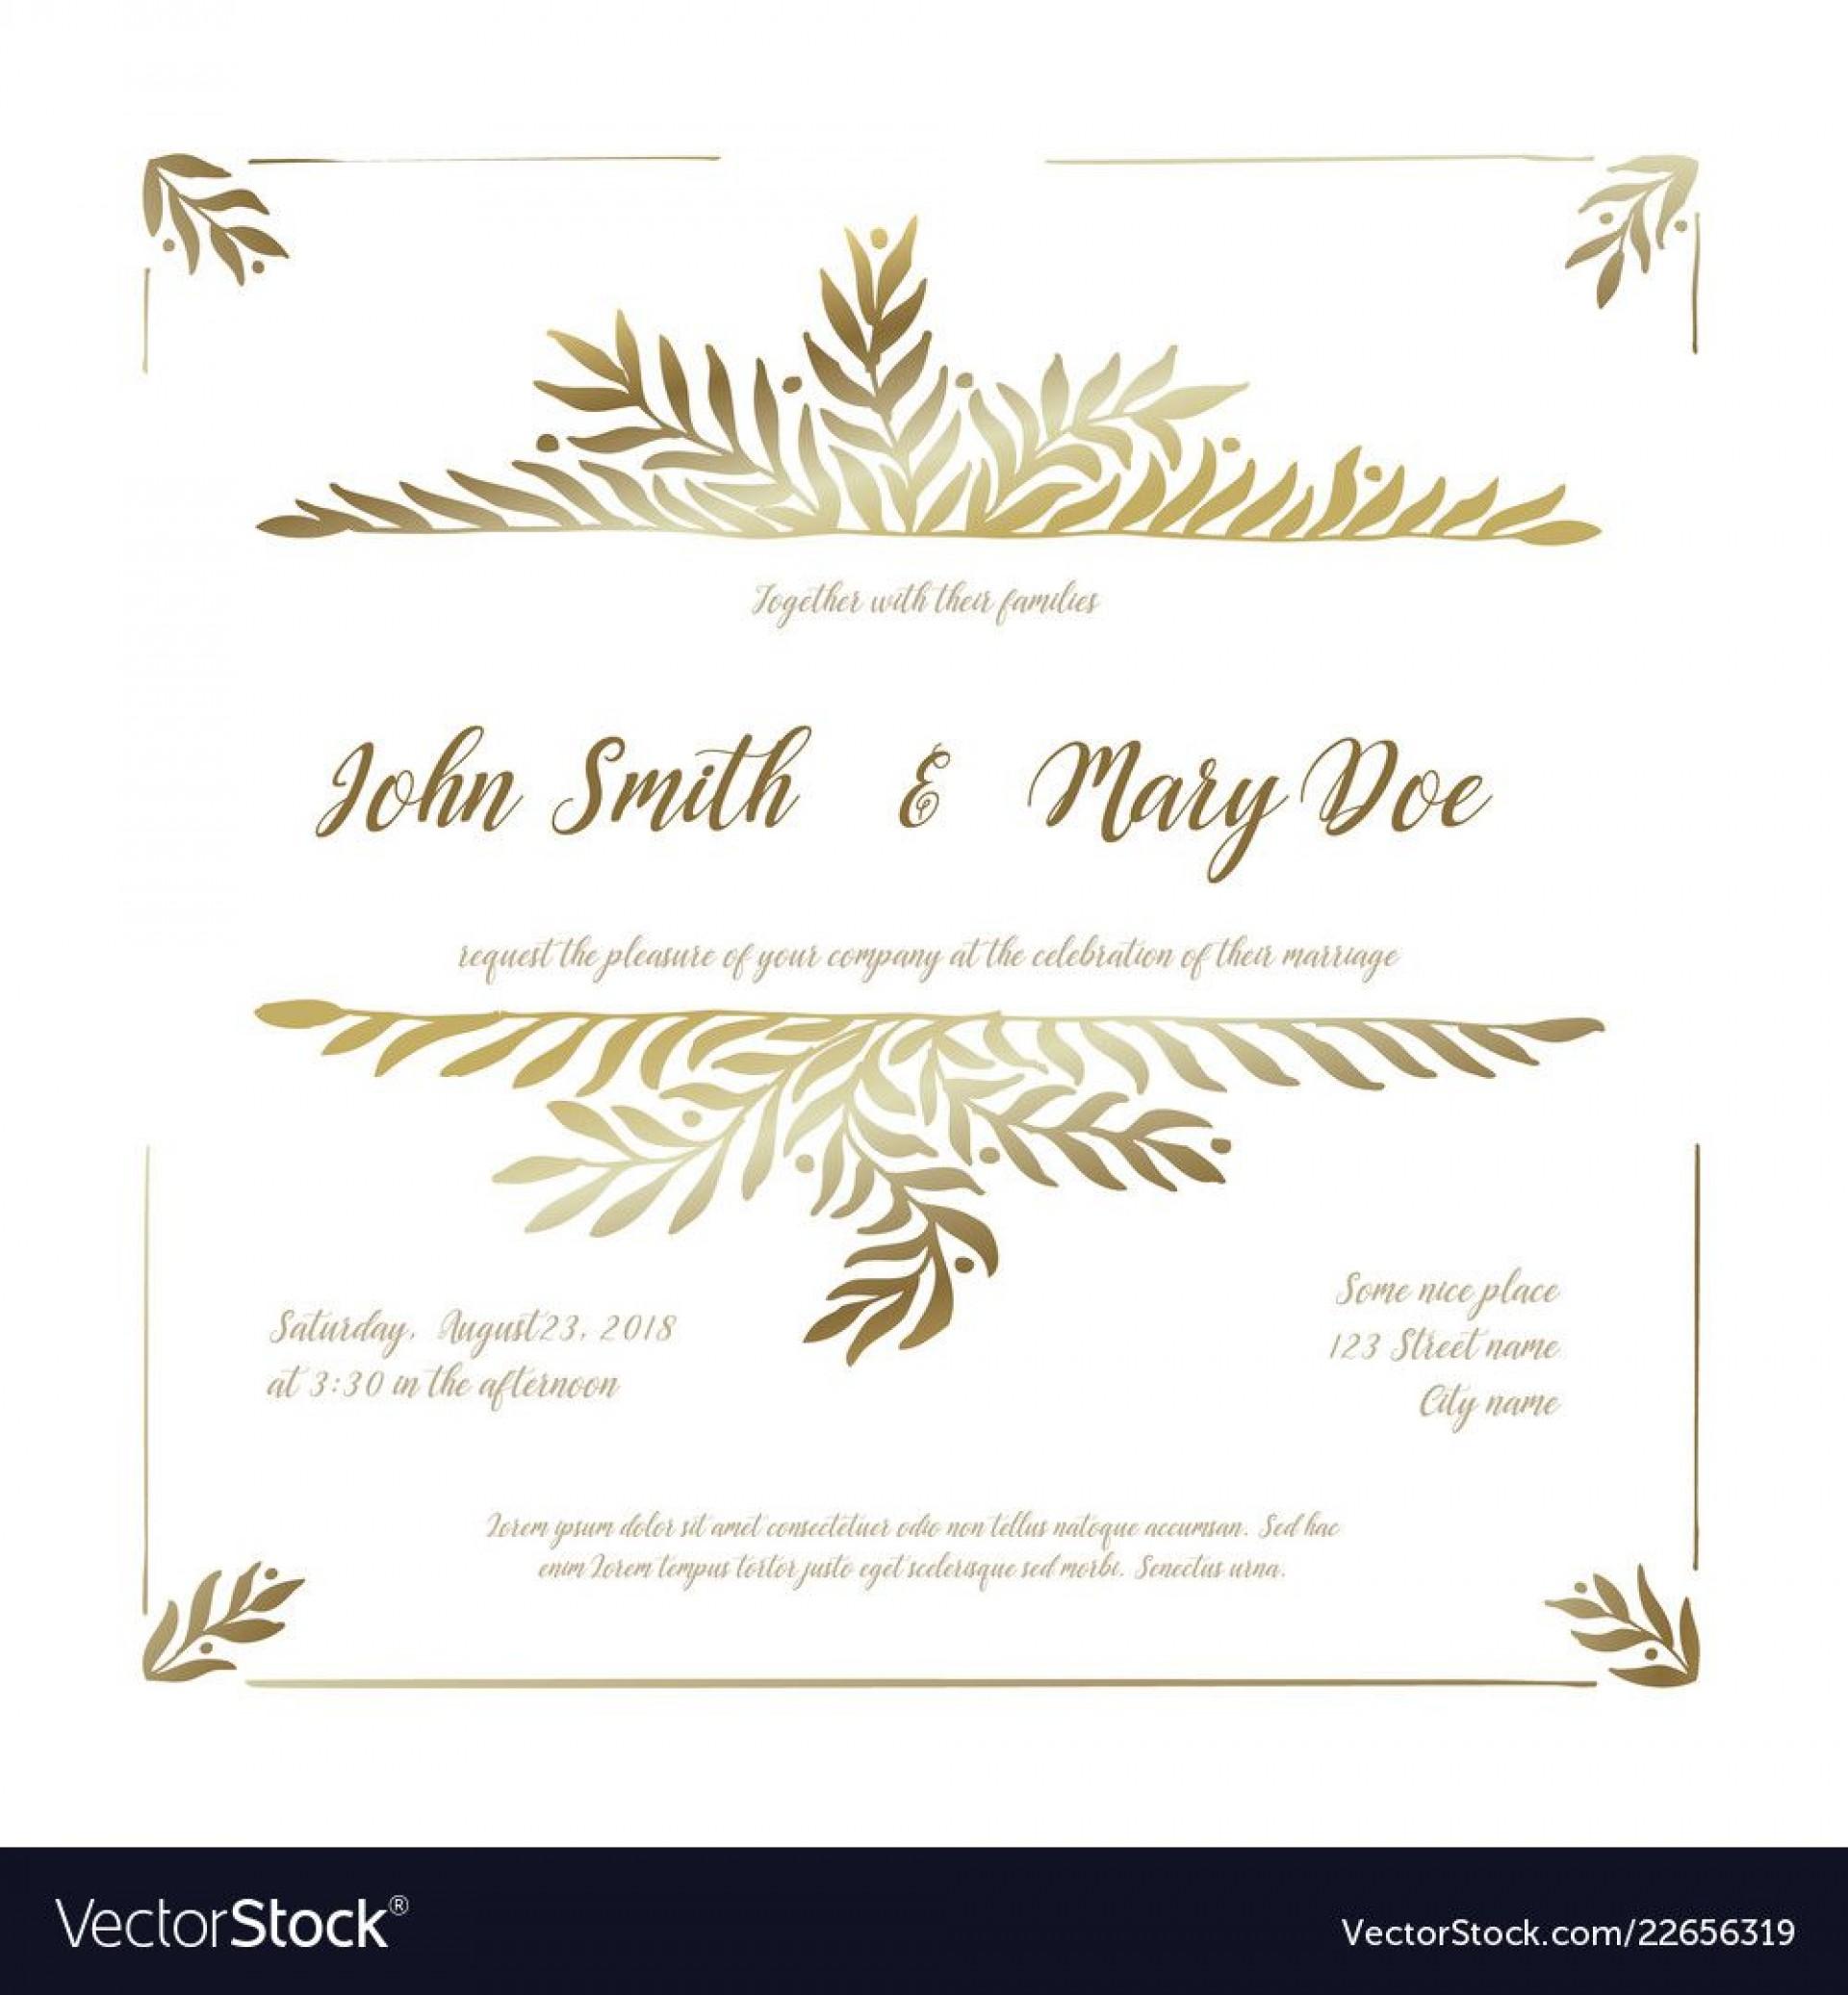 005 Singular Sample Wedding Invitation Card Template Idea  Templates Free Design Response Wording1920